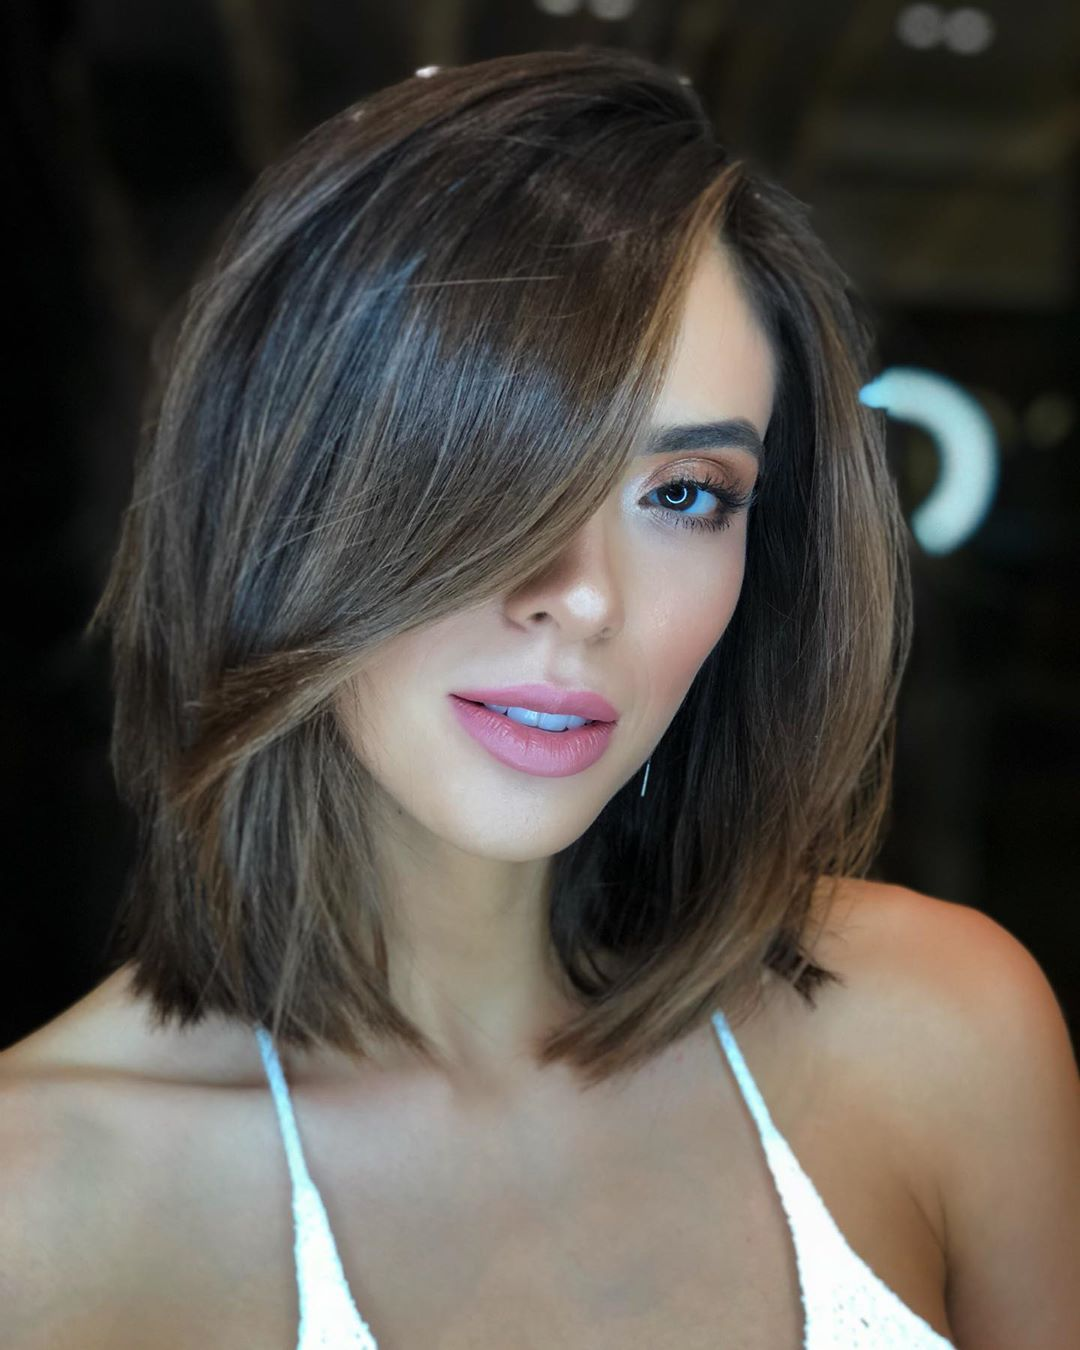 прически на средние волосы с челкой 2020 фото 1